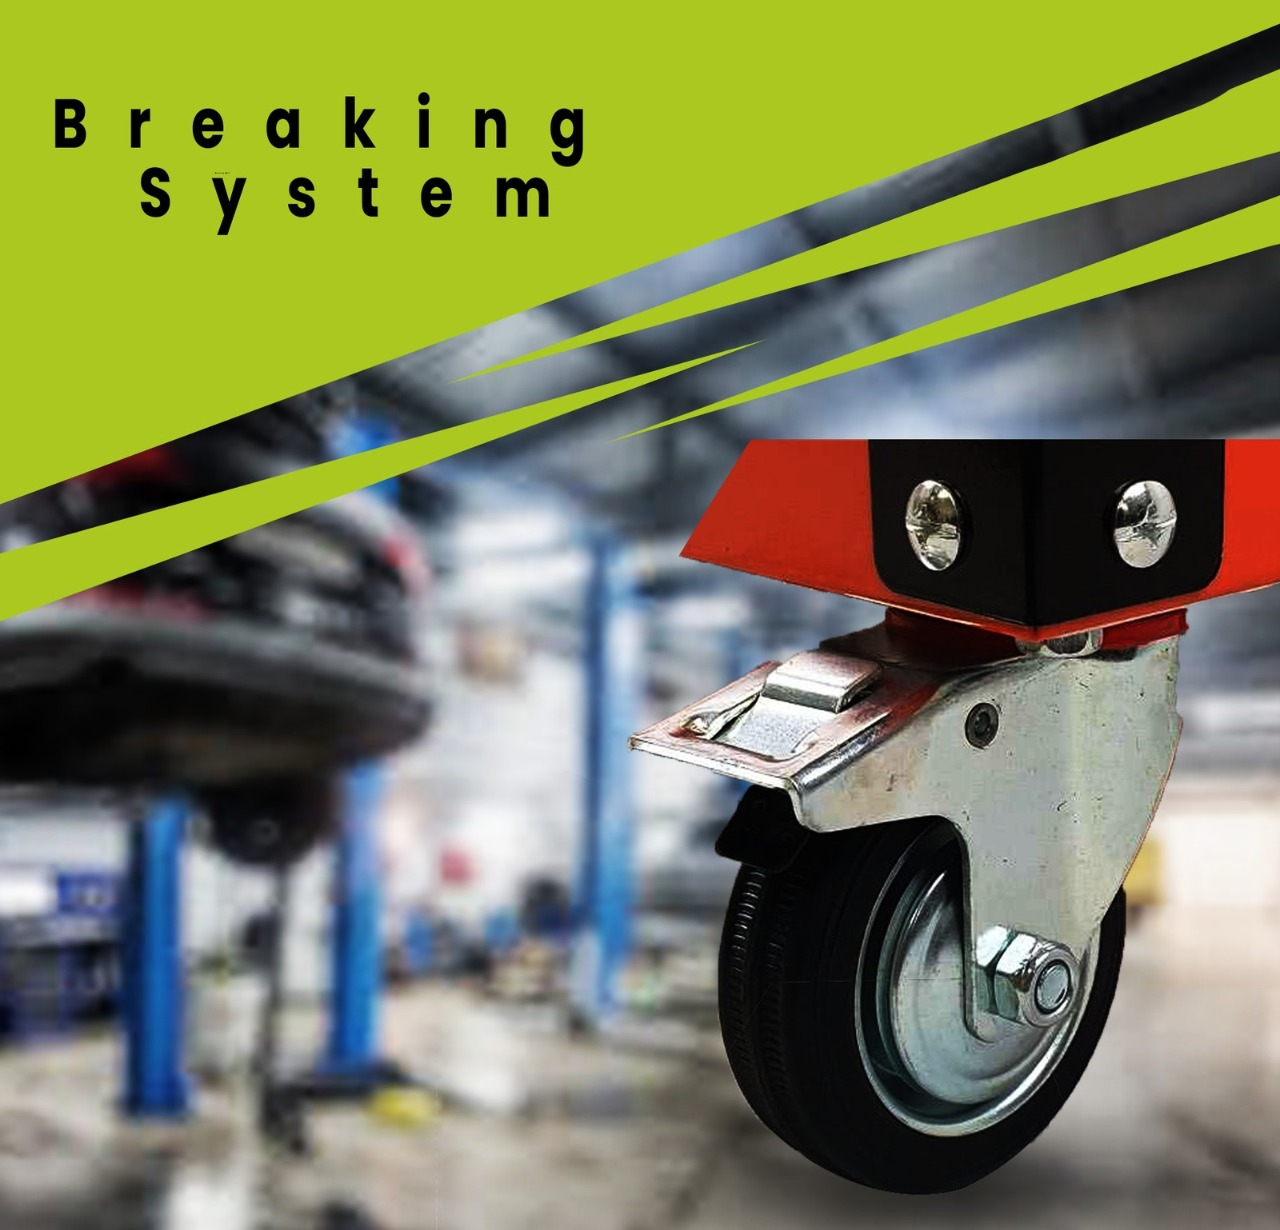 3-Tier Steel Tool Cart With Lock Drawer & Lockable Castors Mechanic Trolley